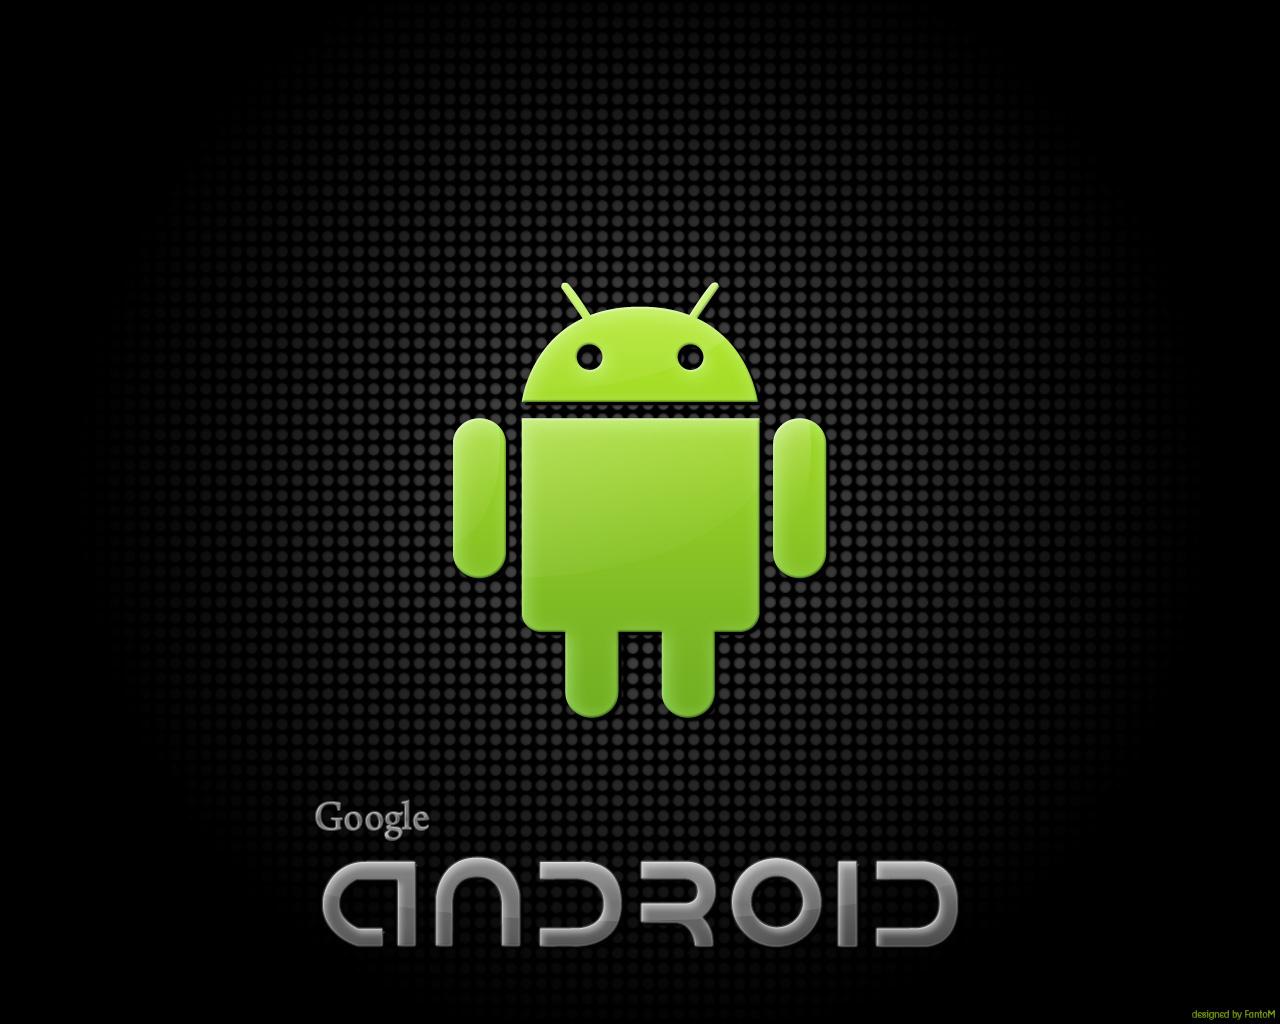 http://4.bp.blogspot.com/-awrulKfiwo4/UNB43UT1Y2I/AAAAAAAAAh0/cfY_qsWZBJk/s1600/Android-wallpaper-desktop-6-hd-desktop-wallpapers.jpg